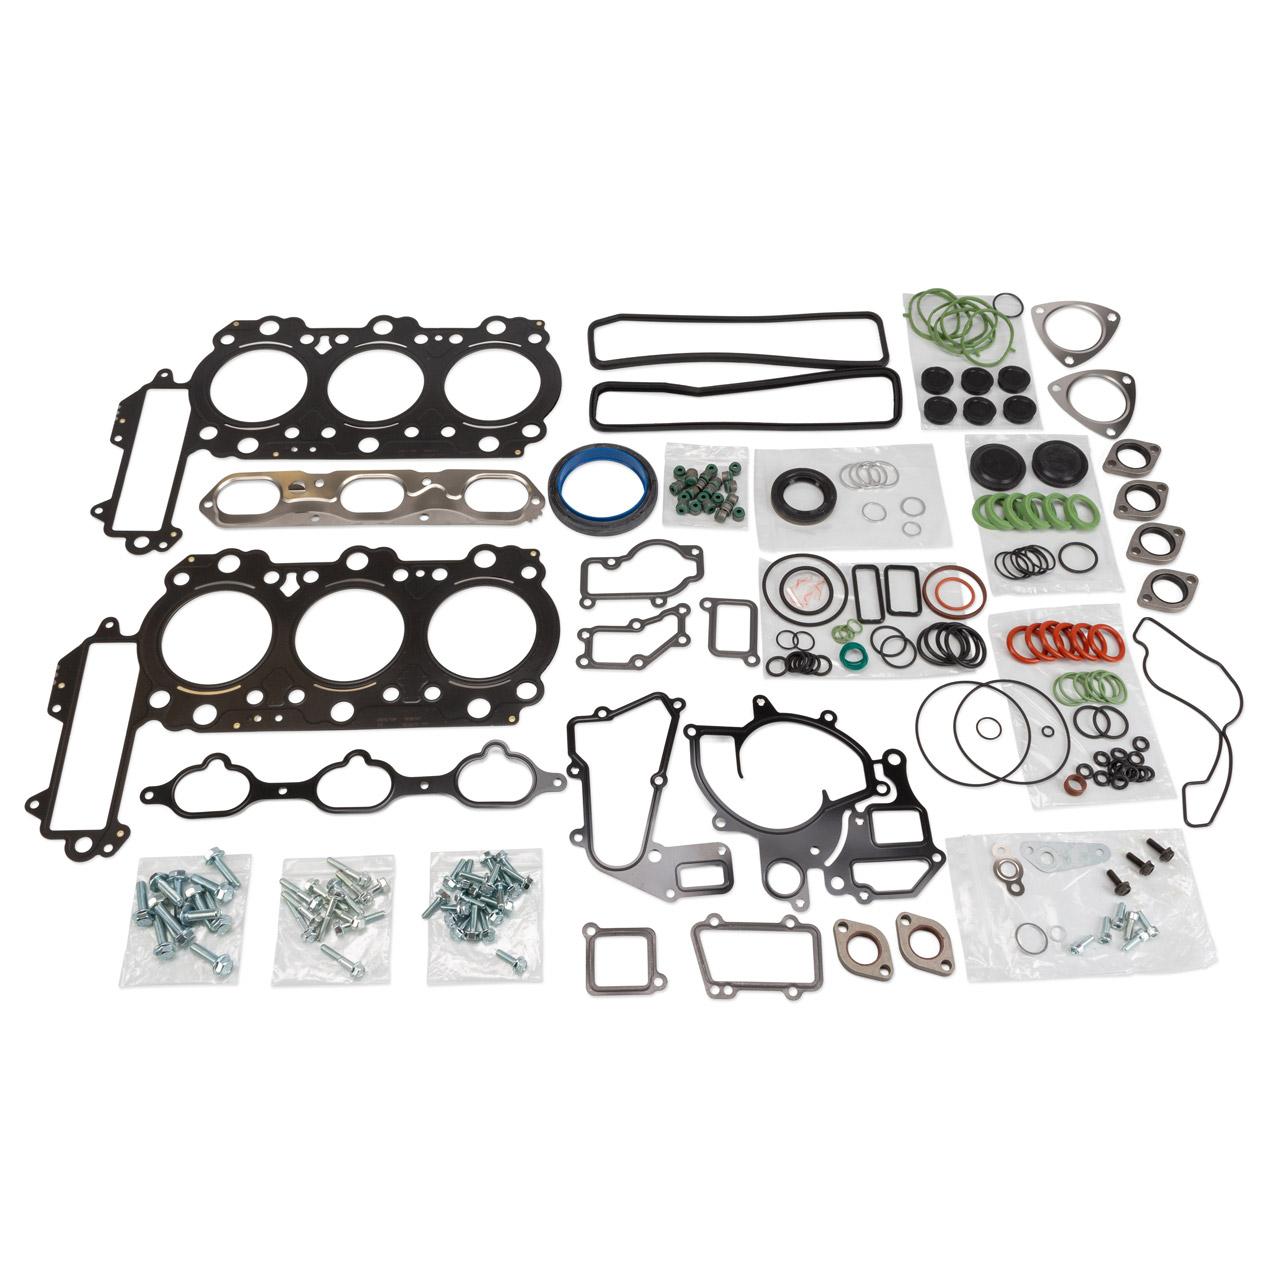 Motordichtungssatz PORSCHE 996 3.6 Carrera / 4 / S / 4S 320/345 PS M96.03